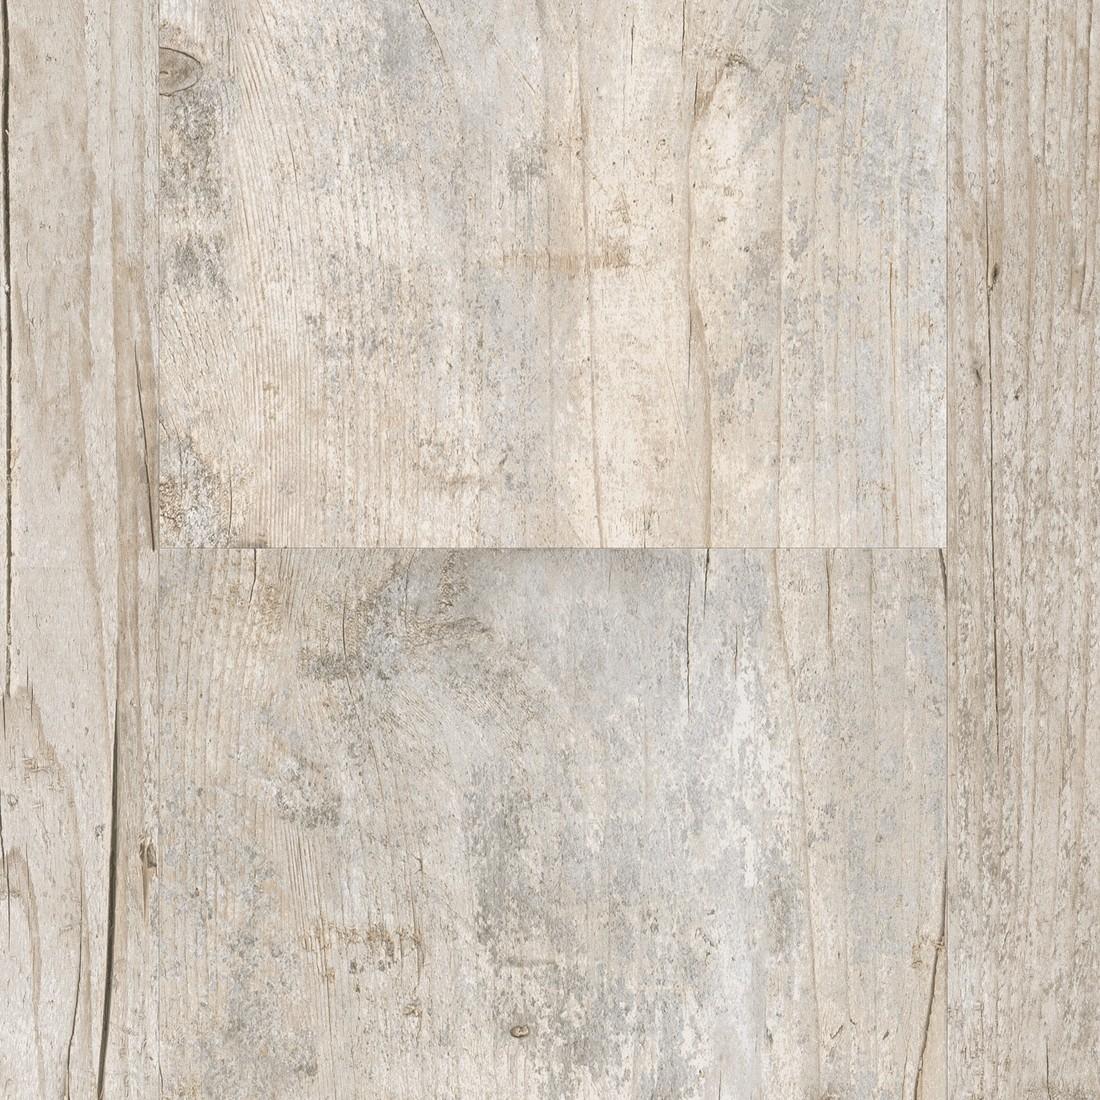 PARADOR Vinyl Classic 2050 Altholz geweißt Gebürstete Struktur Landhausdiele Vollmaterial, Artikel-Nr.: 1513565 – Bild 2